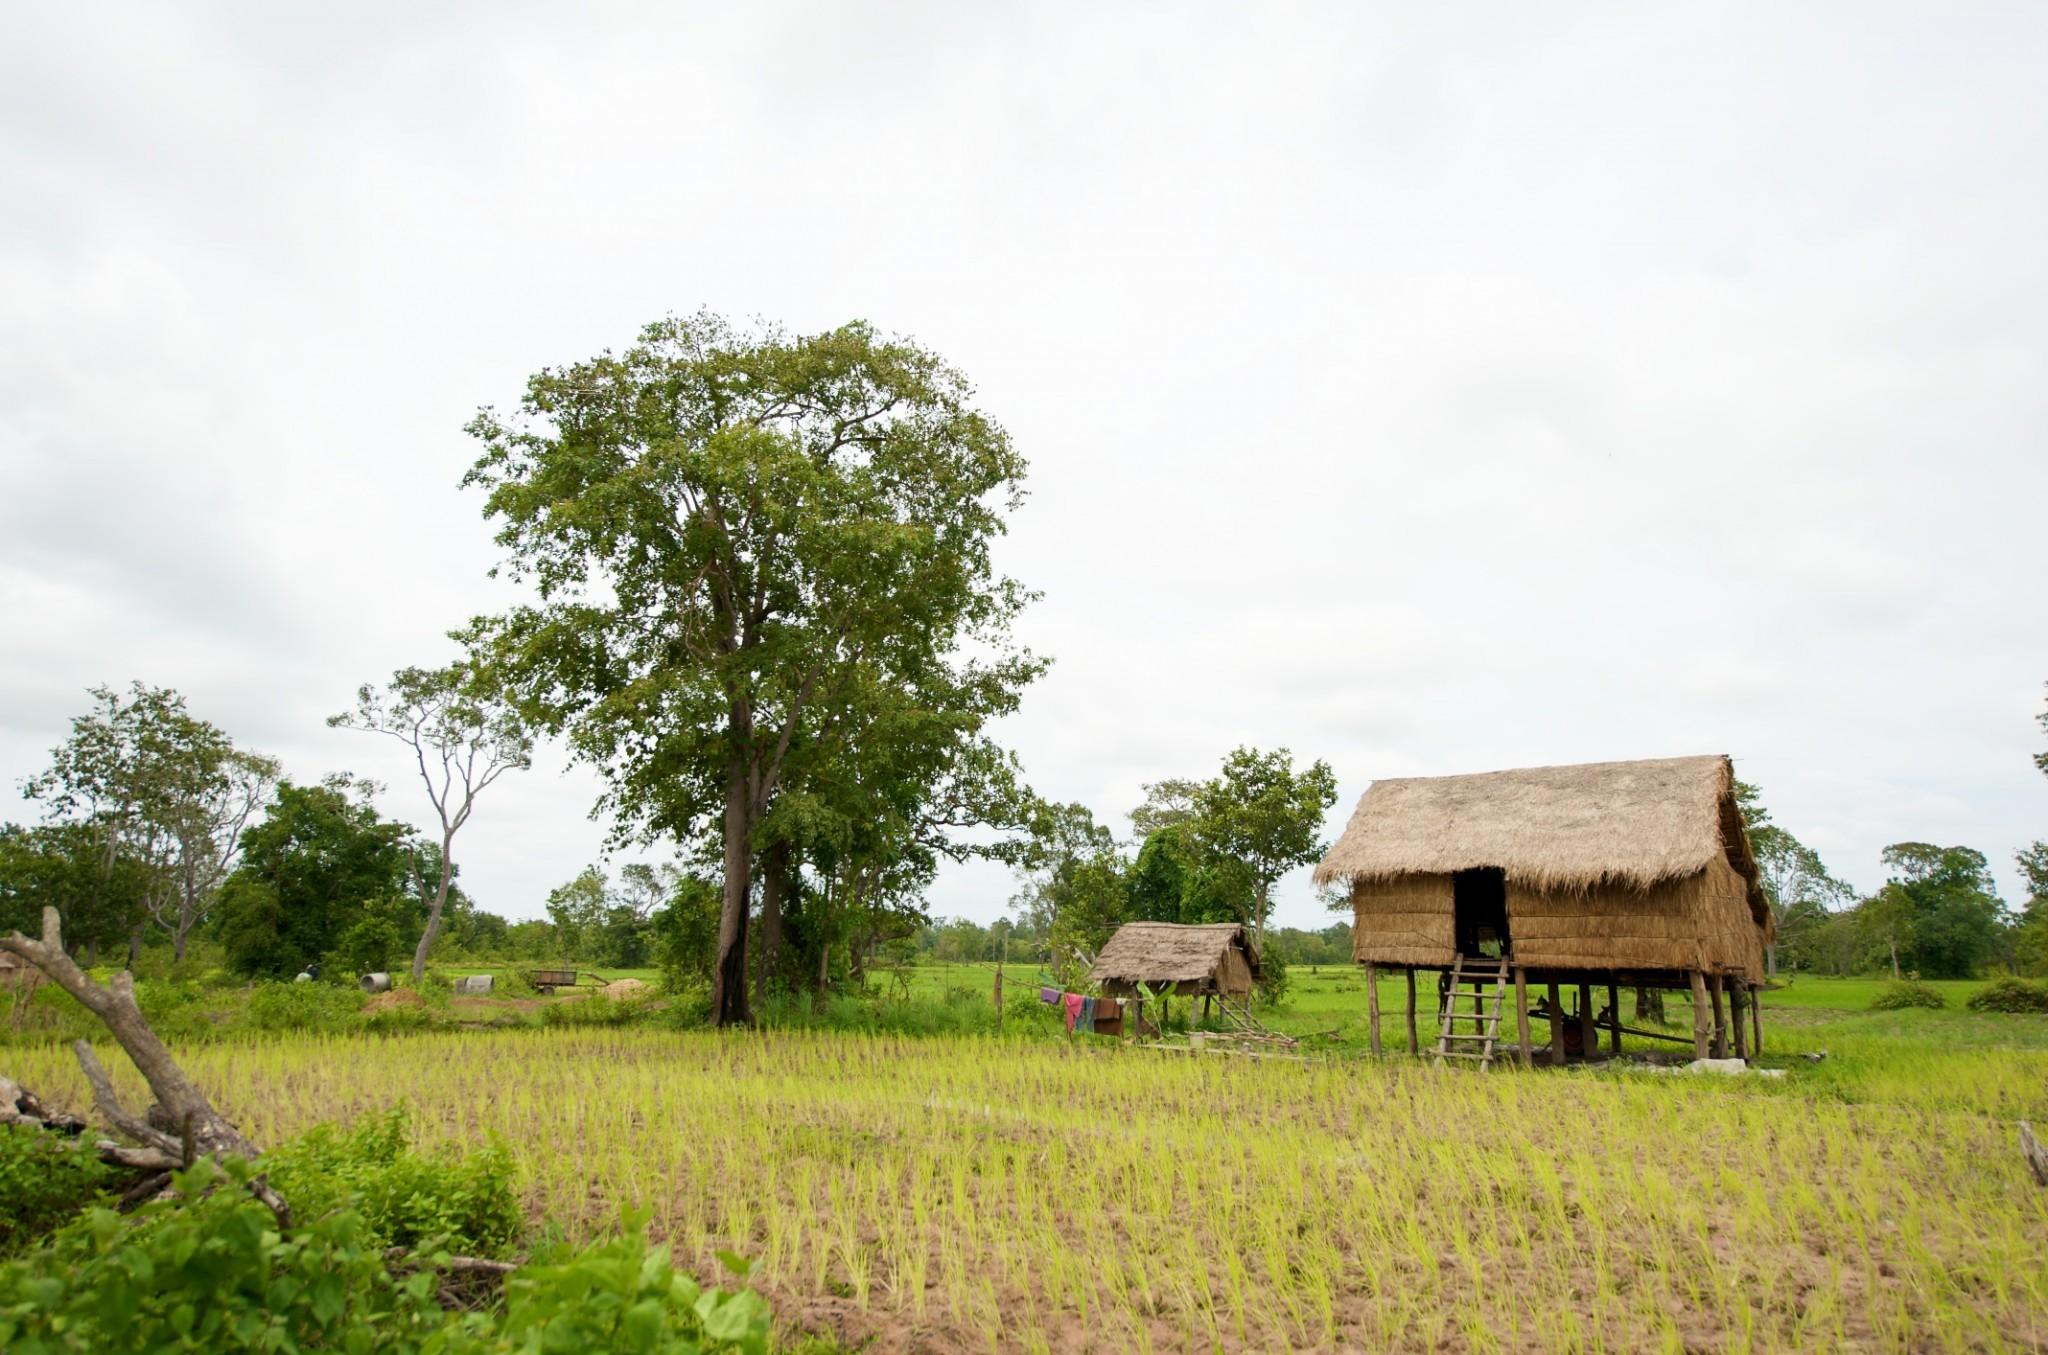 AlexSoh_July09 Cambodia165